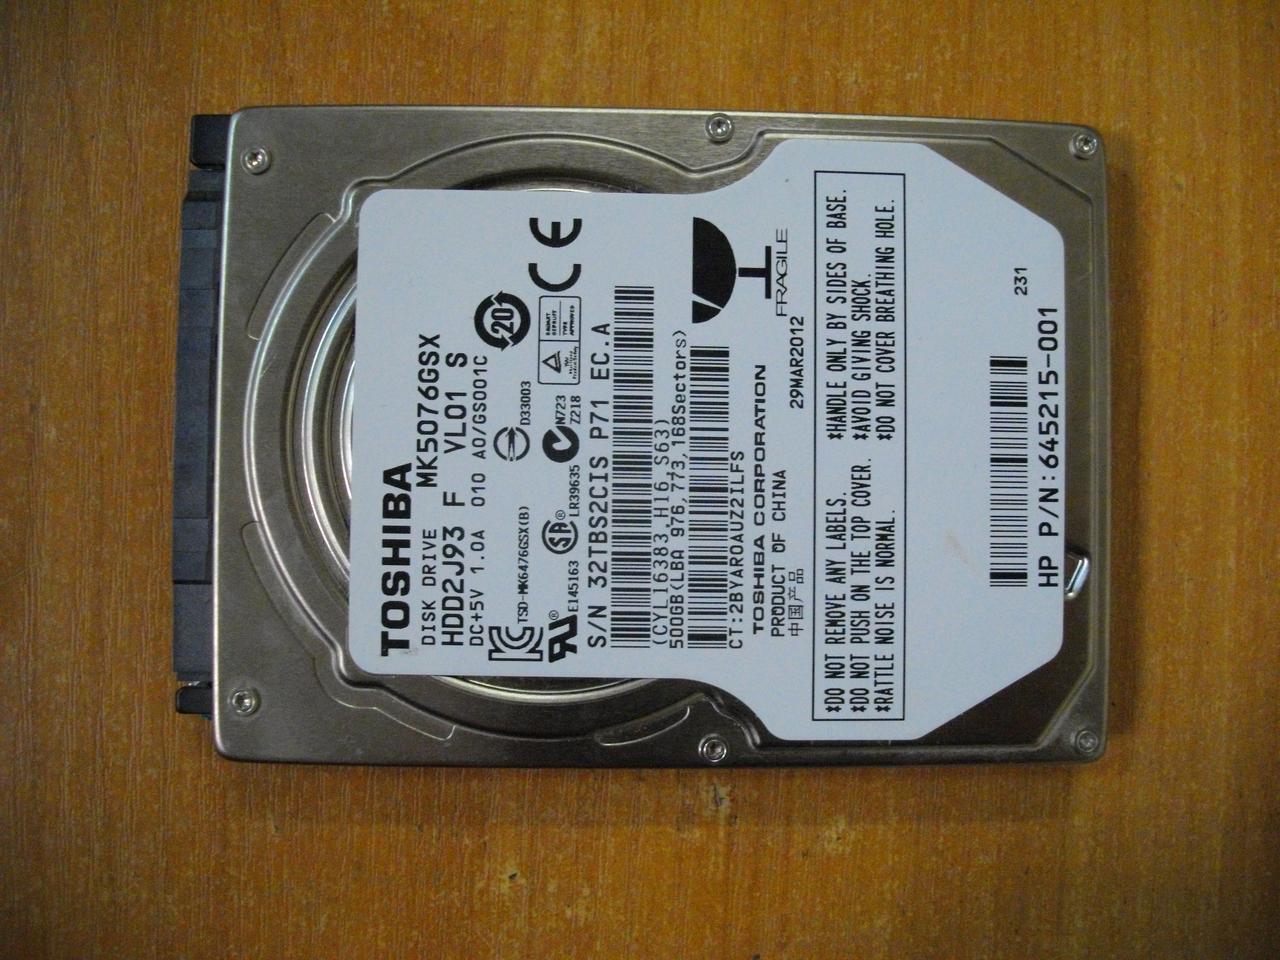 HDD Жесткий диск Toshiba 500GB SATA БУ рабочий, есть БЭД сектора MK5076GSX